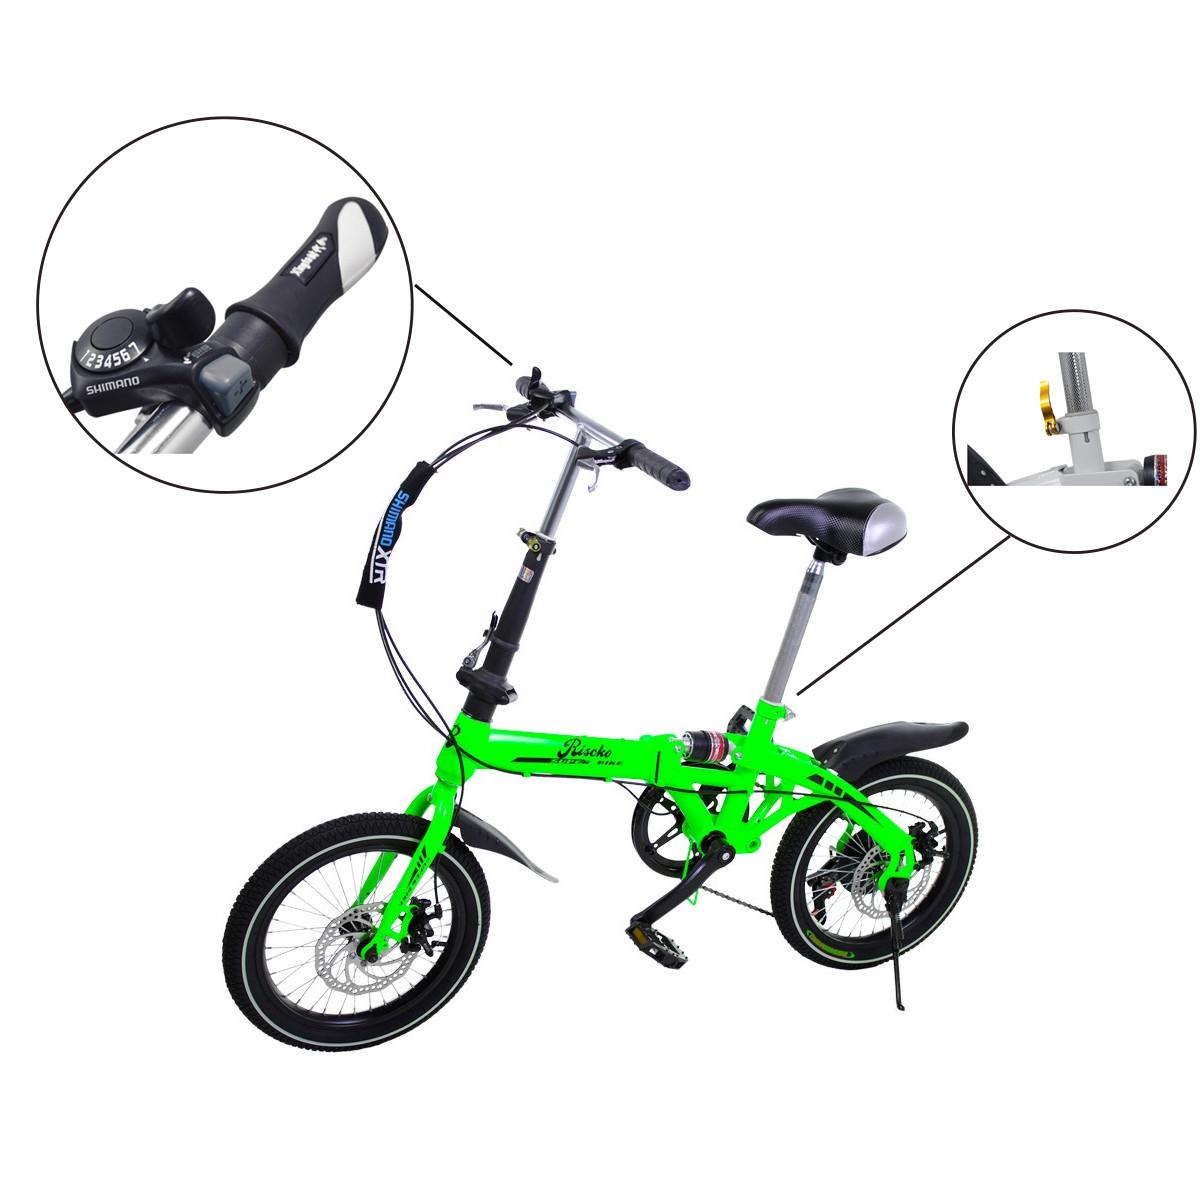 miniatura 15 - Bicicleta-plegable-con-ruedas-de-16-039-039-modelo-Super-Bike